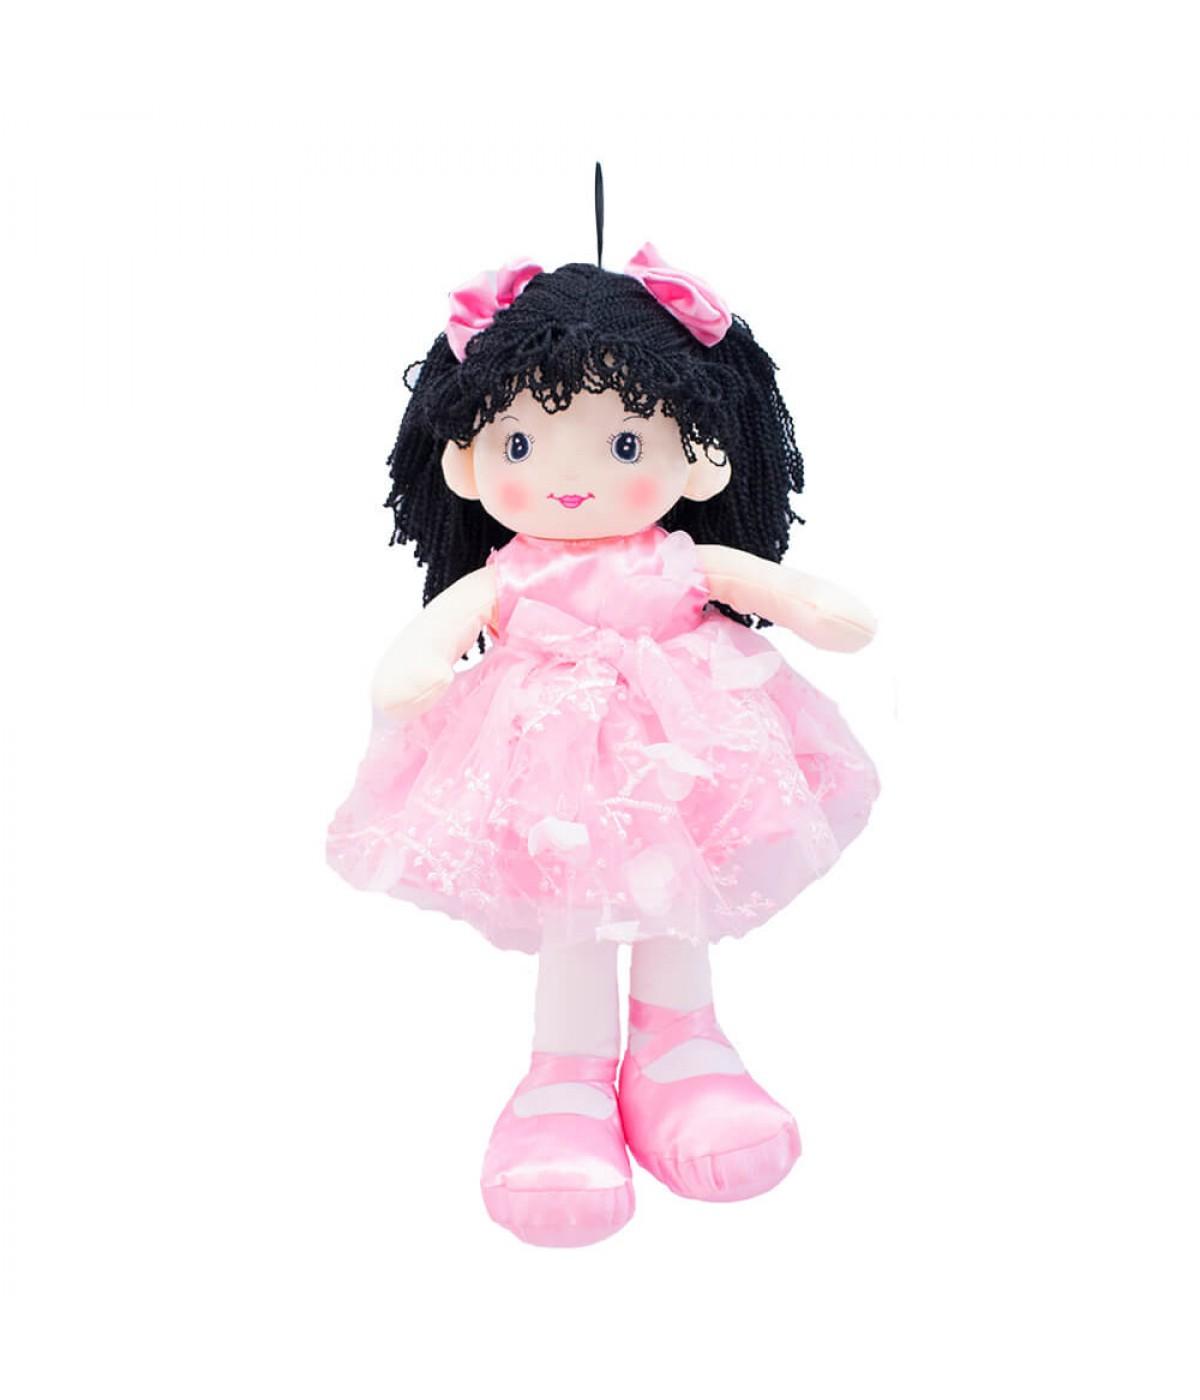 Boneca Bailarina Vestido Rosa 48cm